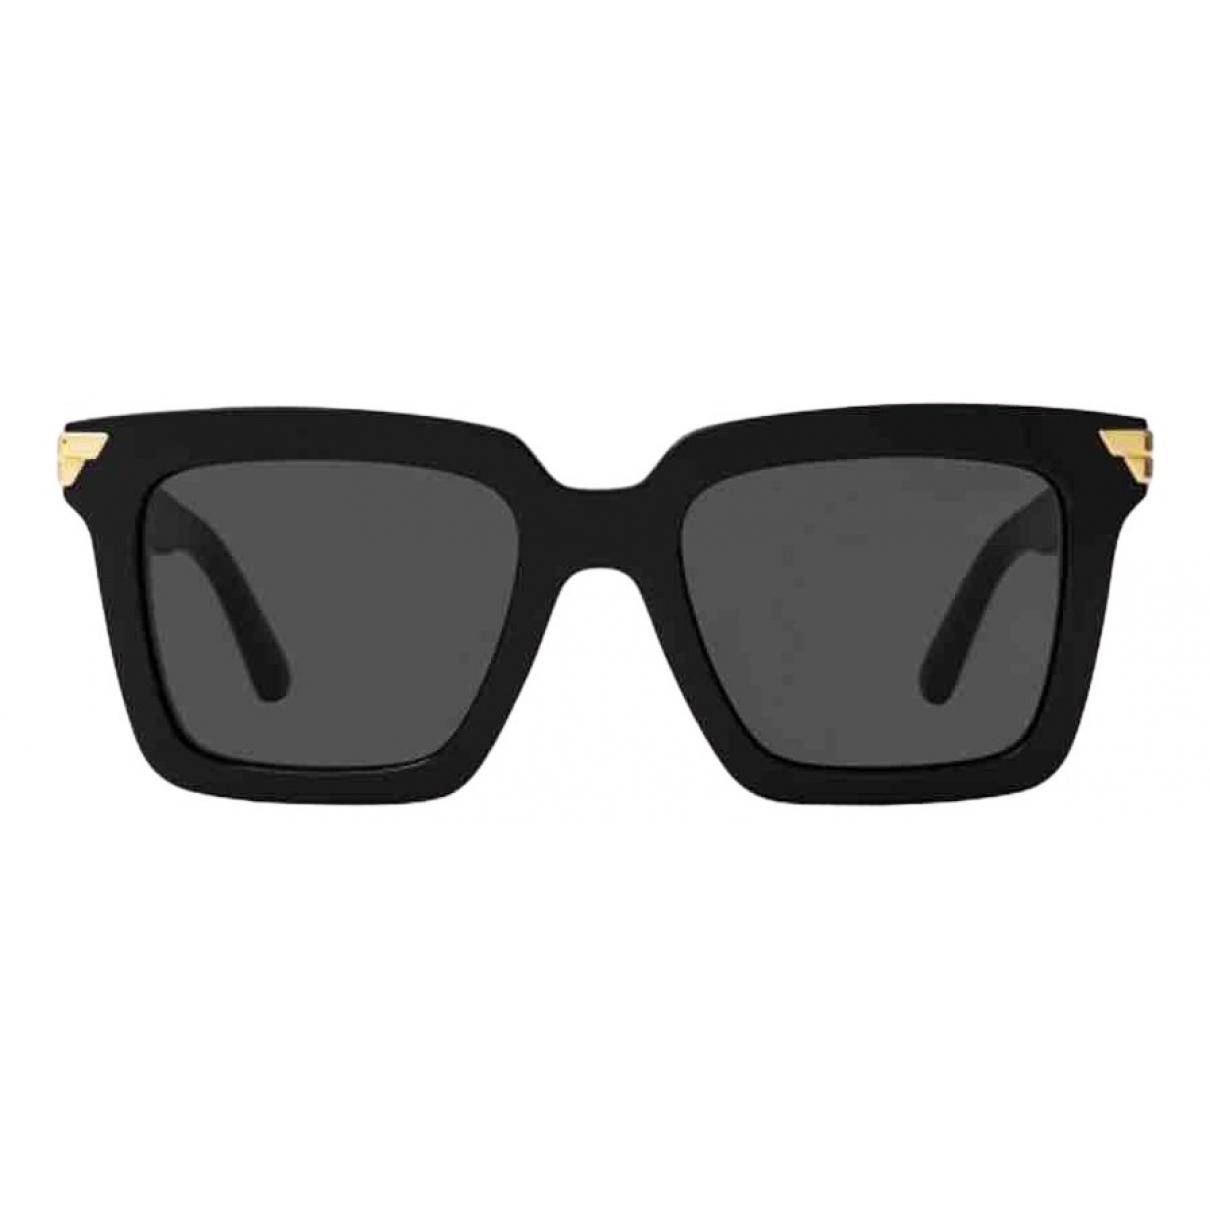 Bottega Veneta \N Sonnenbrillen in  Schwarz Kunststoff